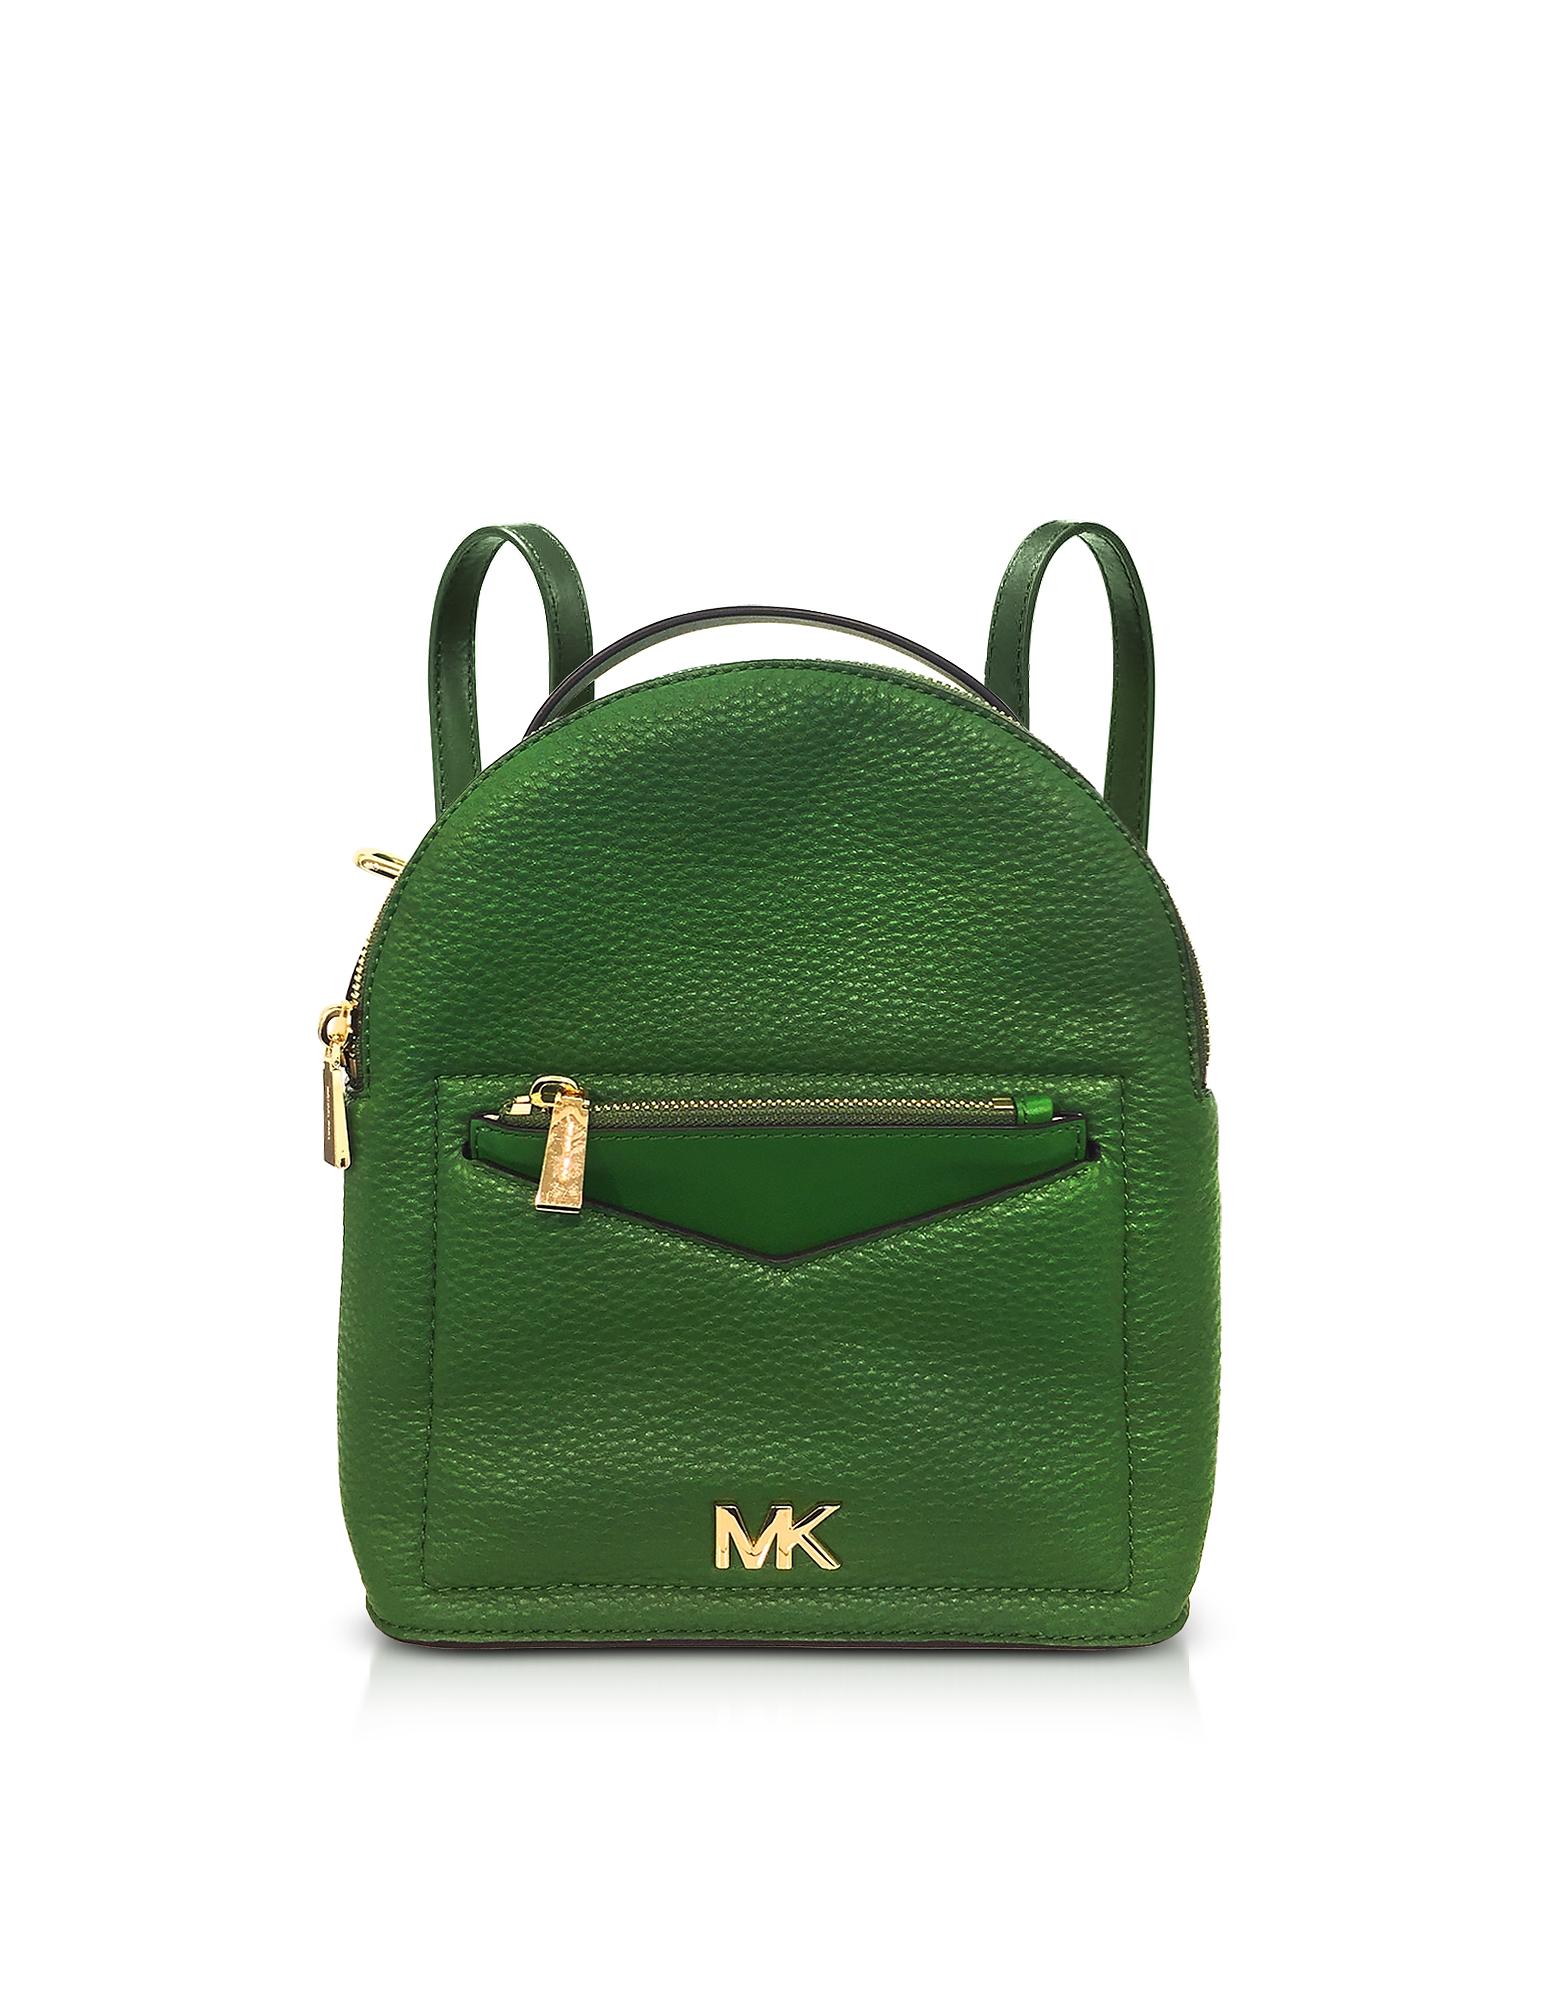 Michael Kors Handbags, Jessa Small Pebbled Leather Convertible Backpack